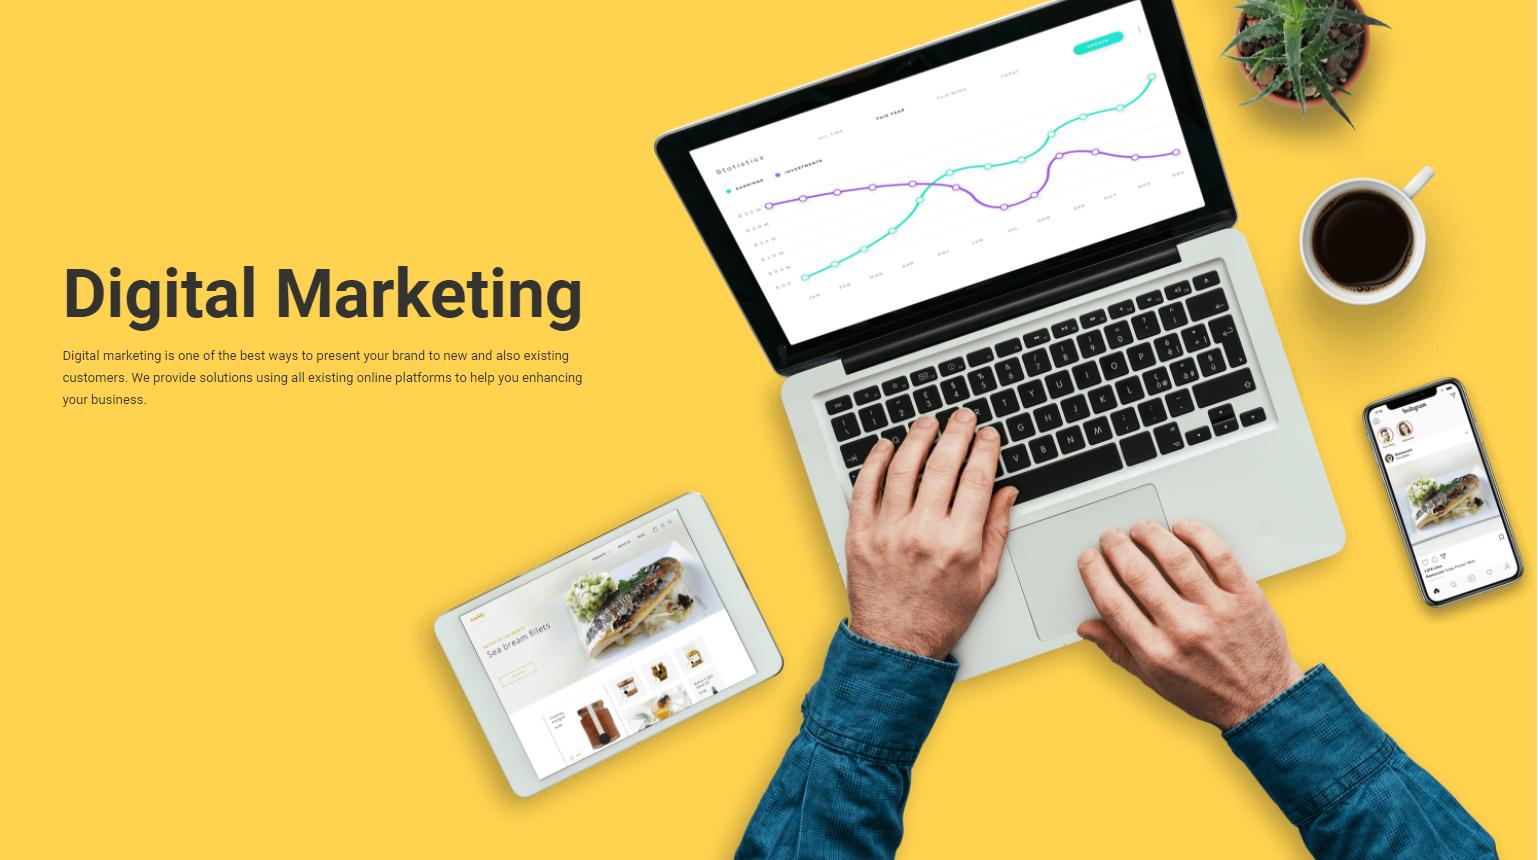 Digital Marketing Image'